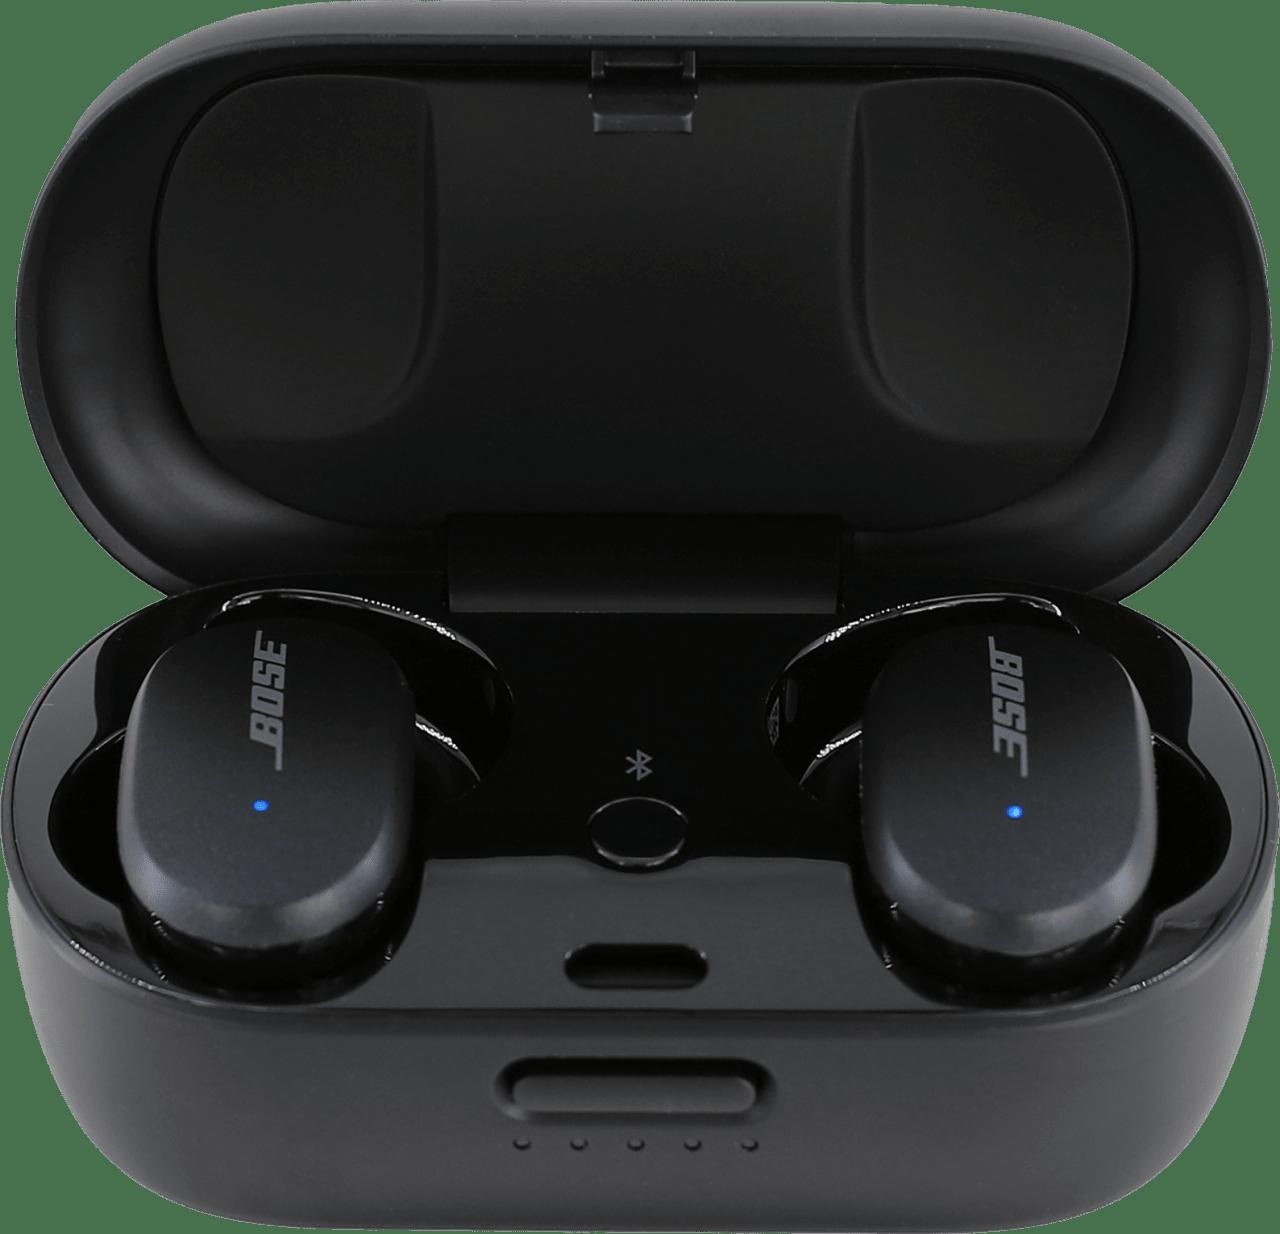 Black Bose QuietComfort Noise-cancelling In-ear Bluetooth Headphones.3